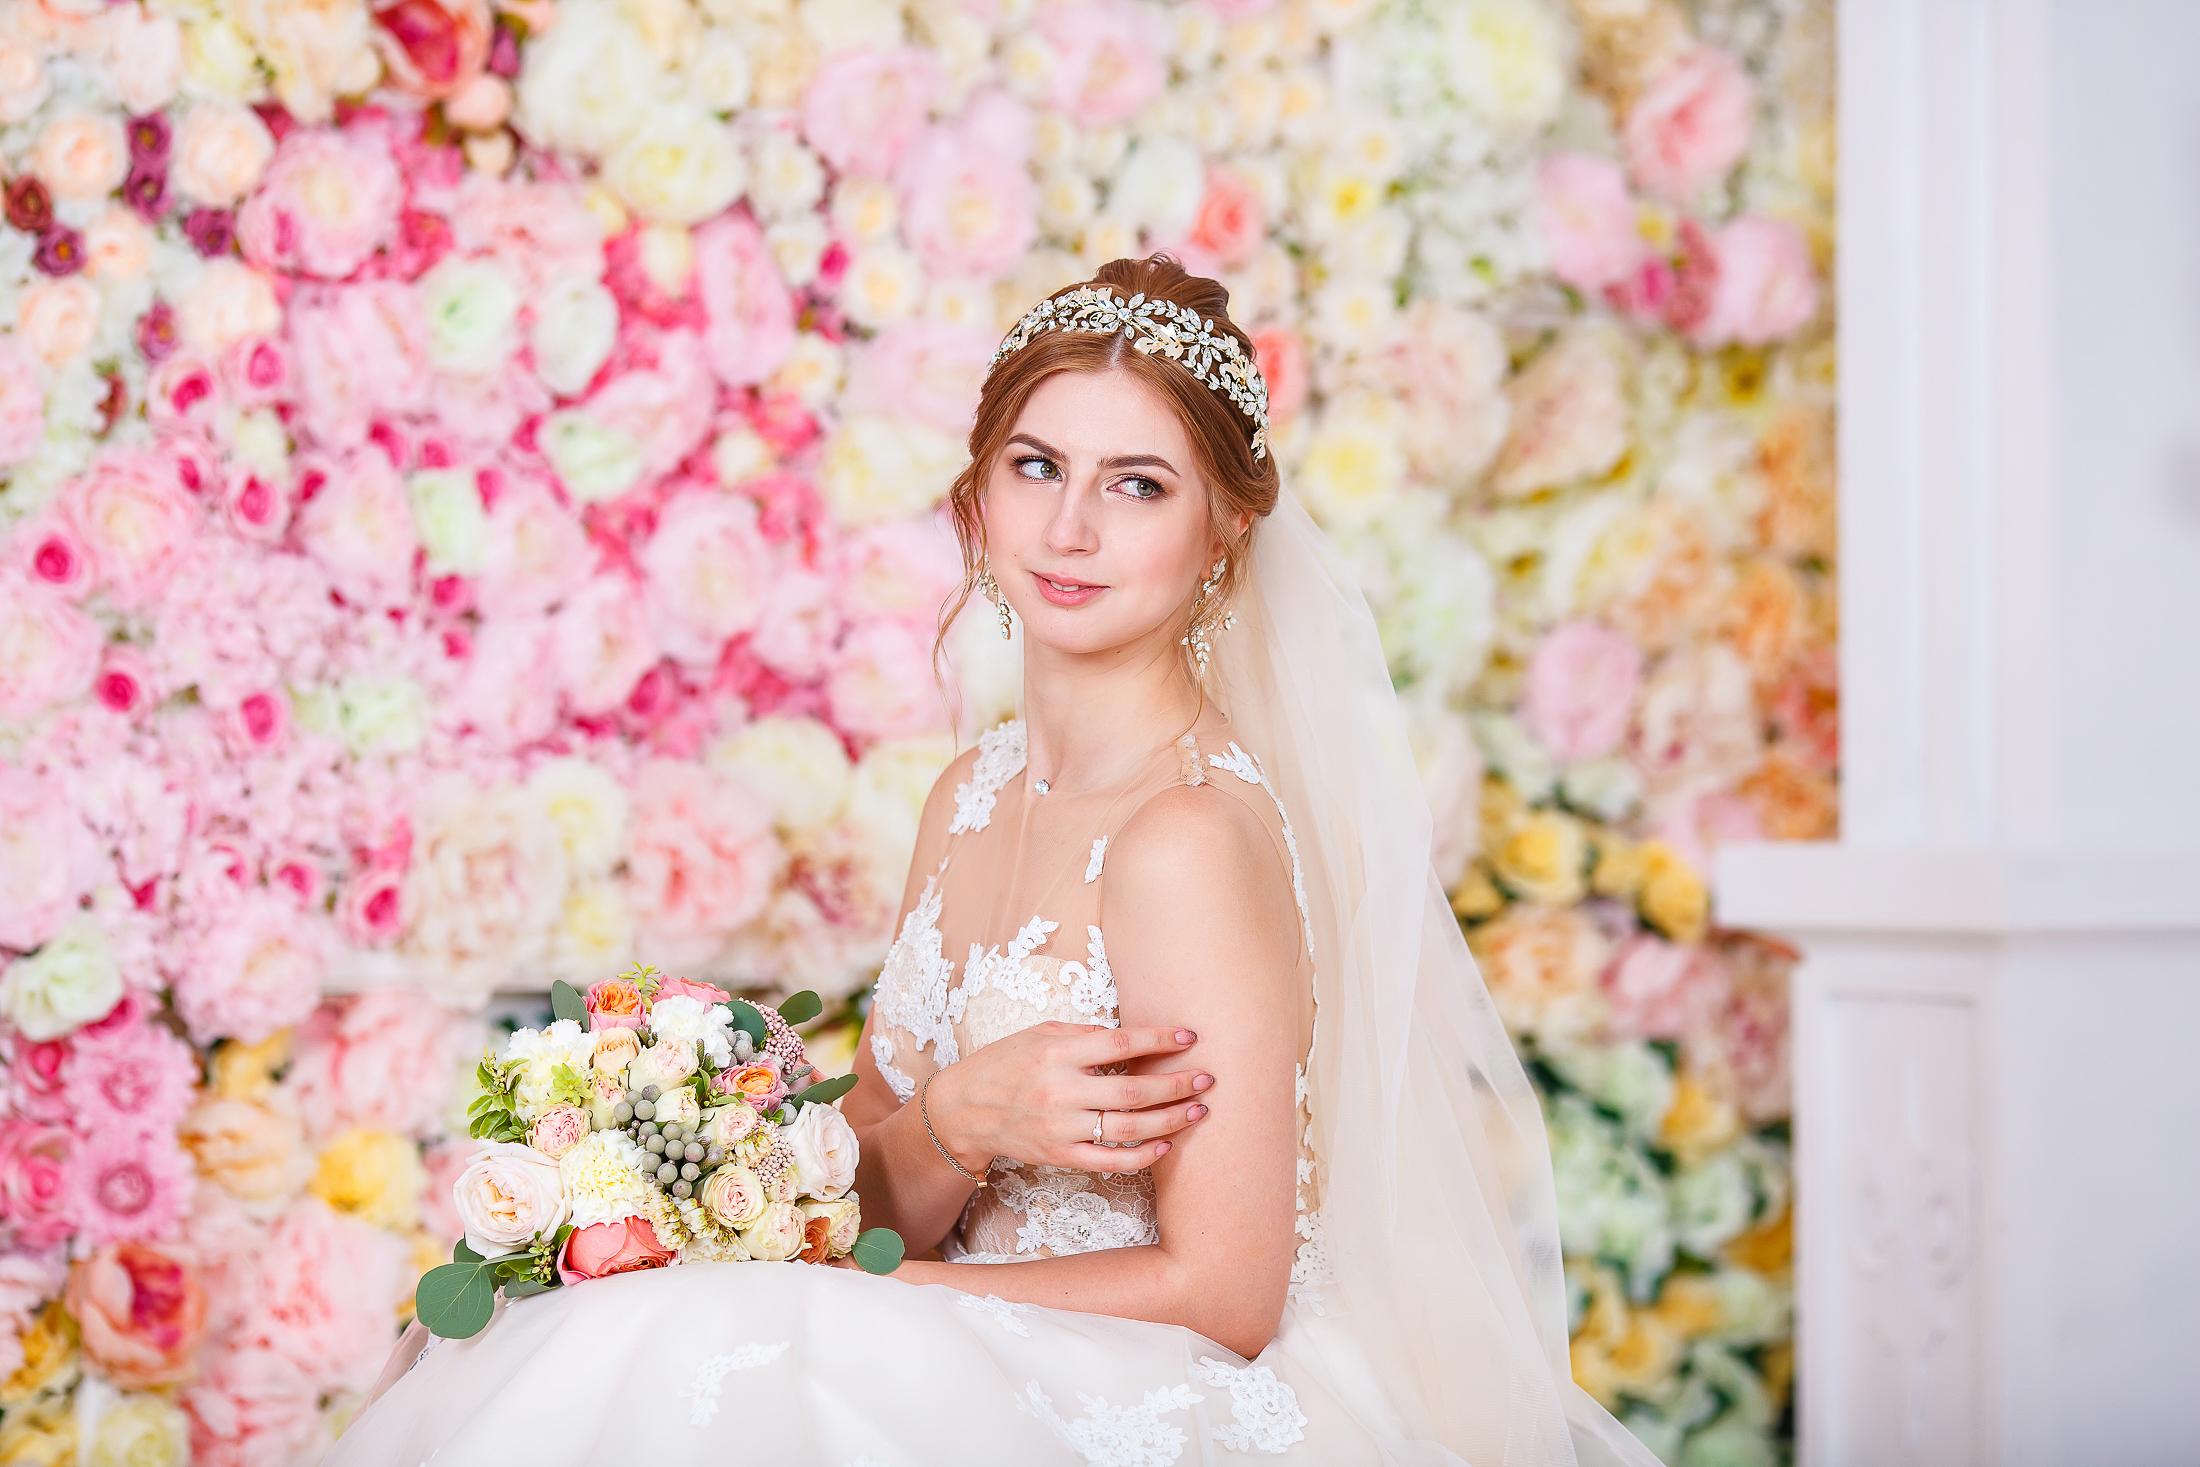 Татьяна Ассаулова в Хабаровске